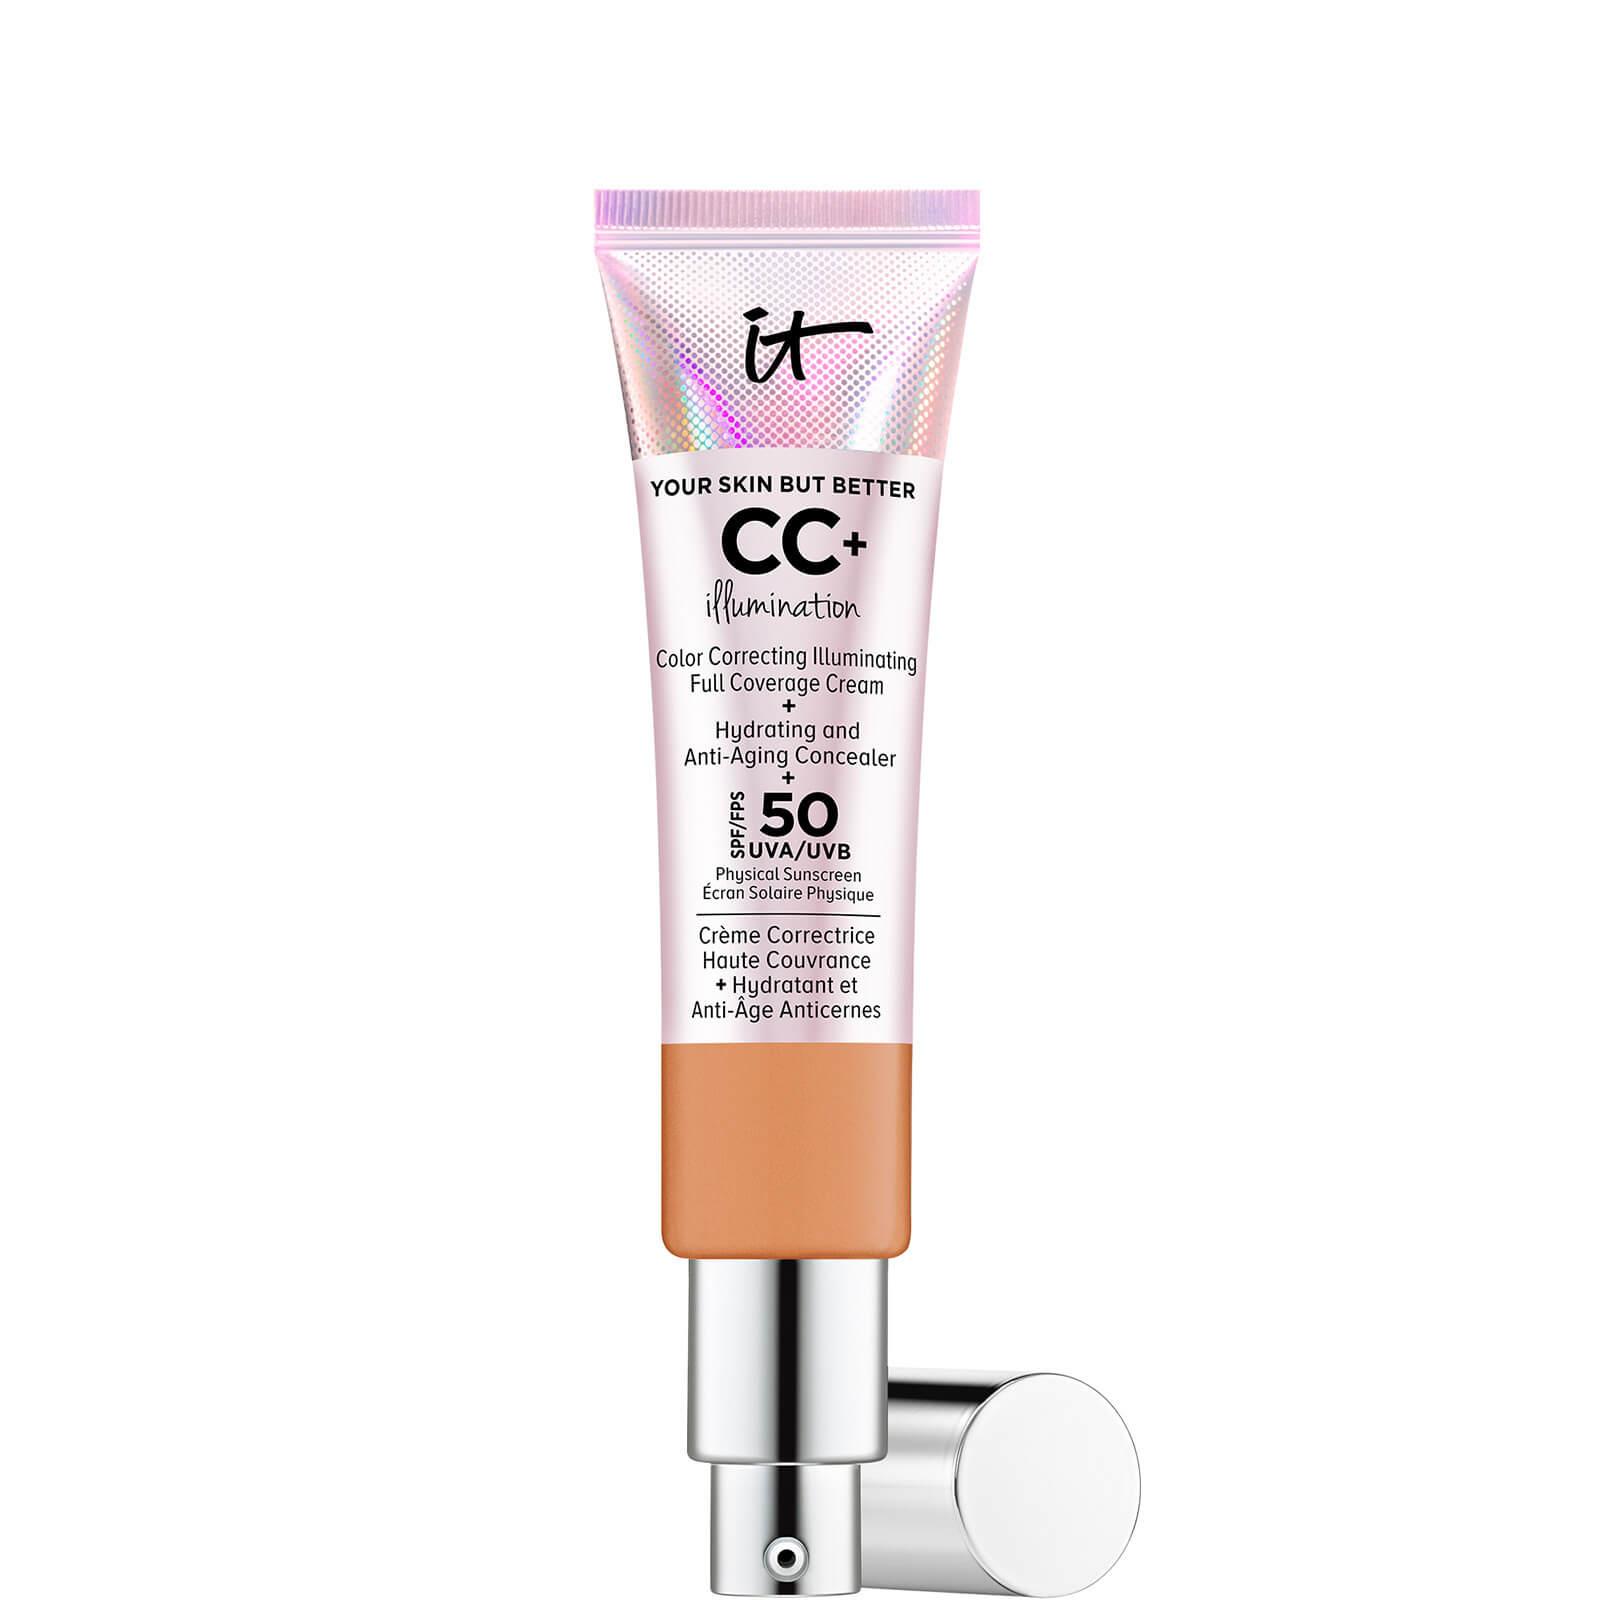 Купить IT Cosmetics Your Skin But Better CC+ Illumination SPF50 32ml (Various Shades) - Tan